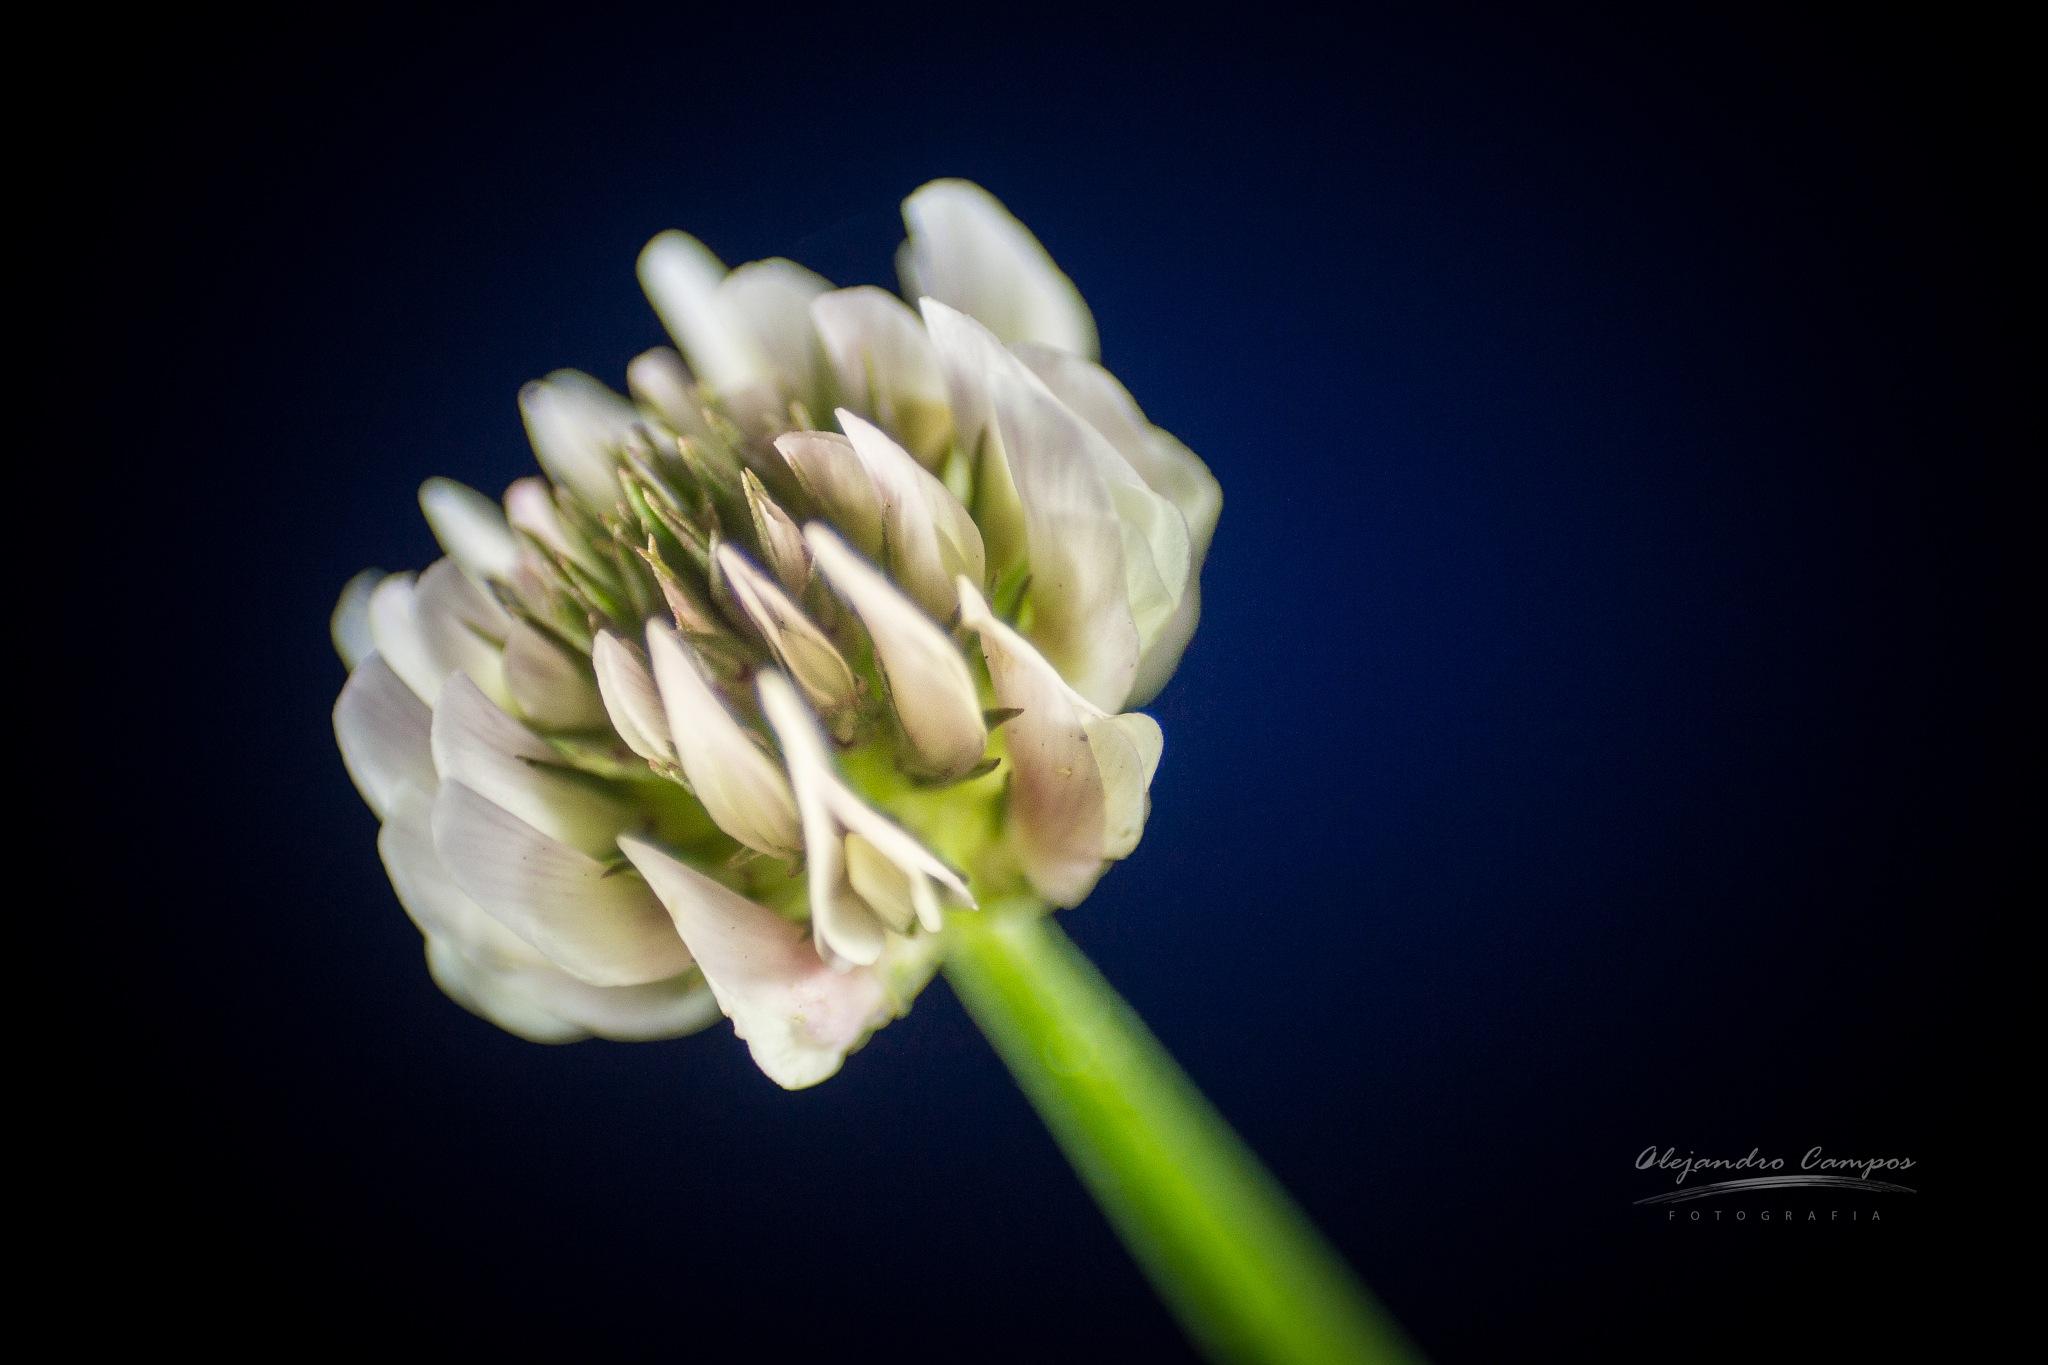 Those details. by alejandrocamposfotografia